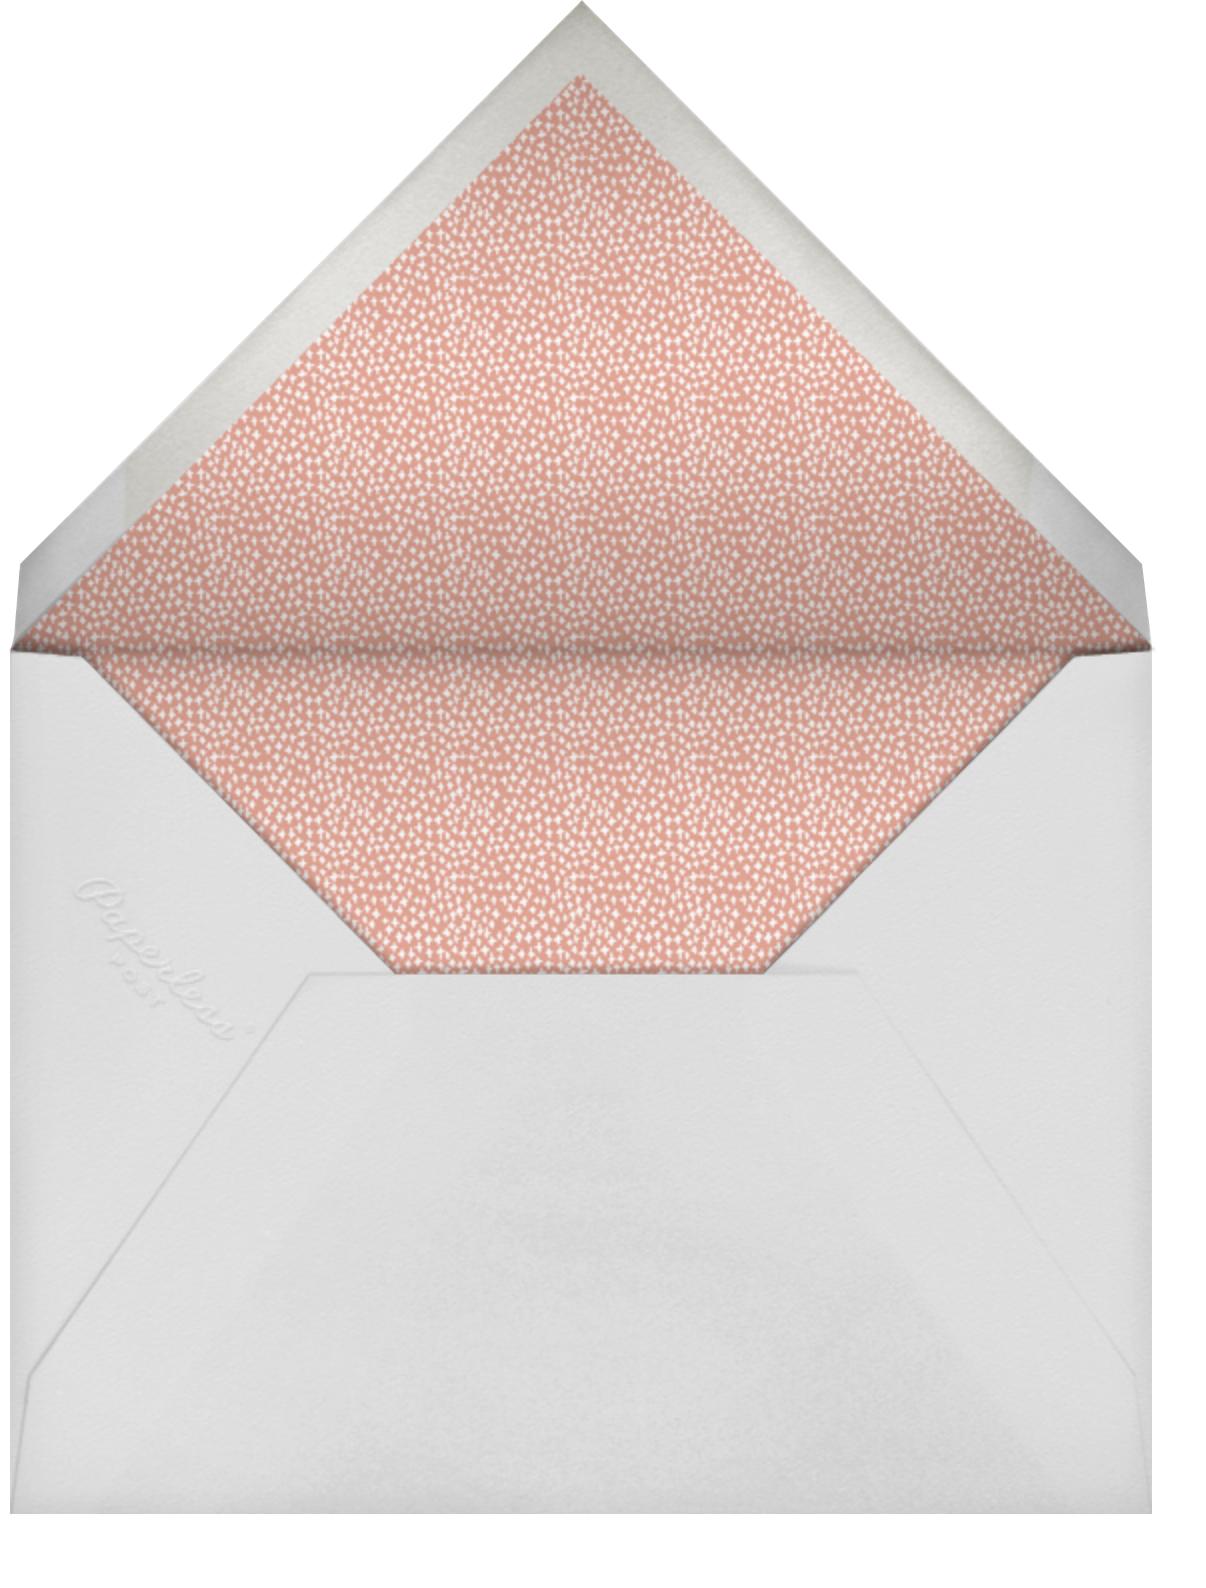 You Can Wear the Bridesmaid's Dress Again - Mr. Boddington's Studio - Envelope